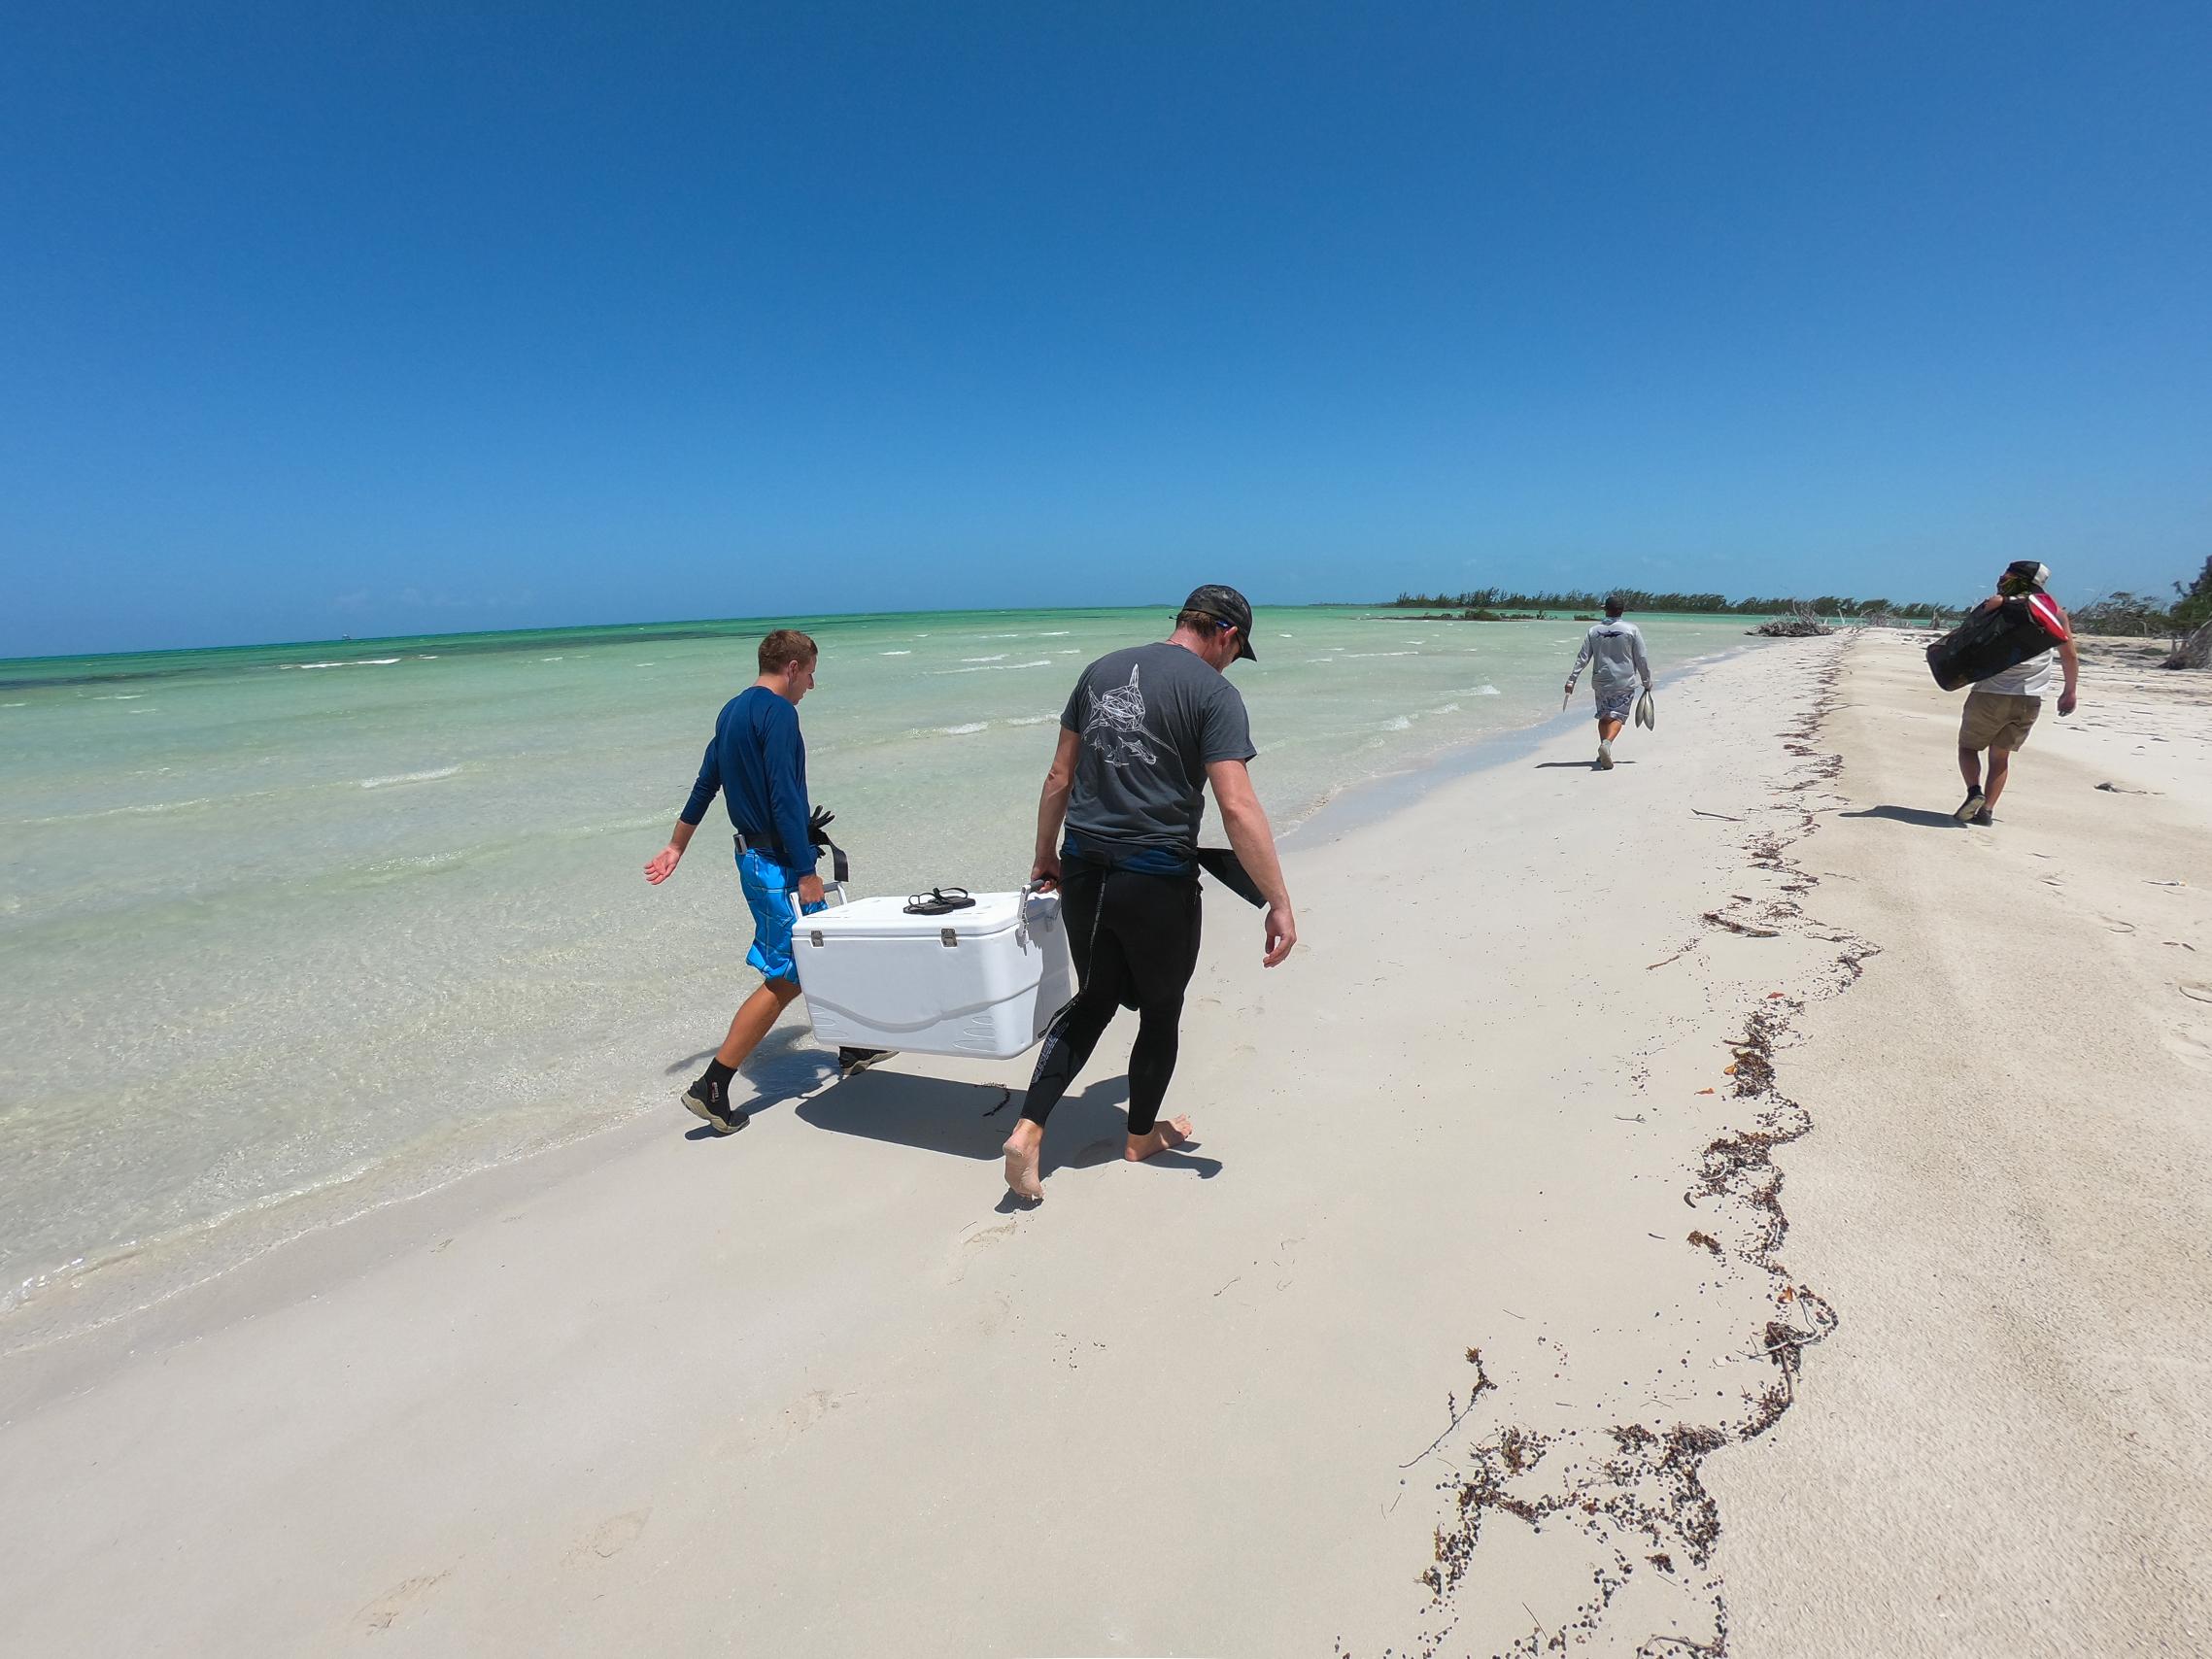 Guests prepare to explore a potential sawfish location